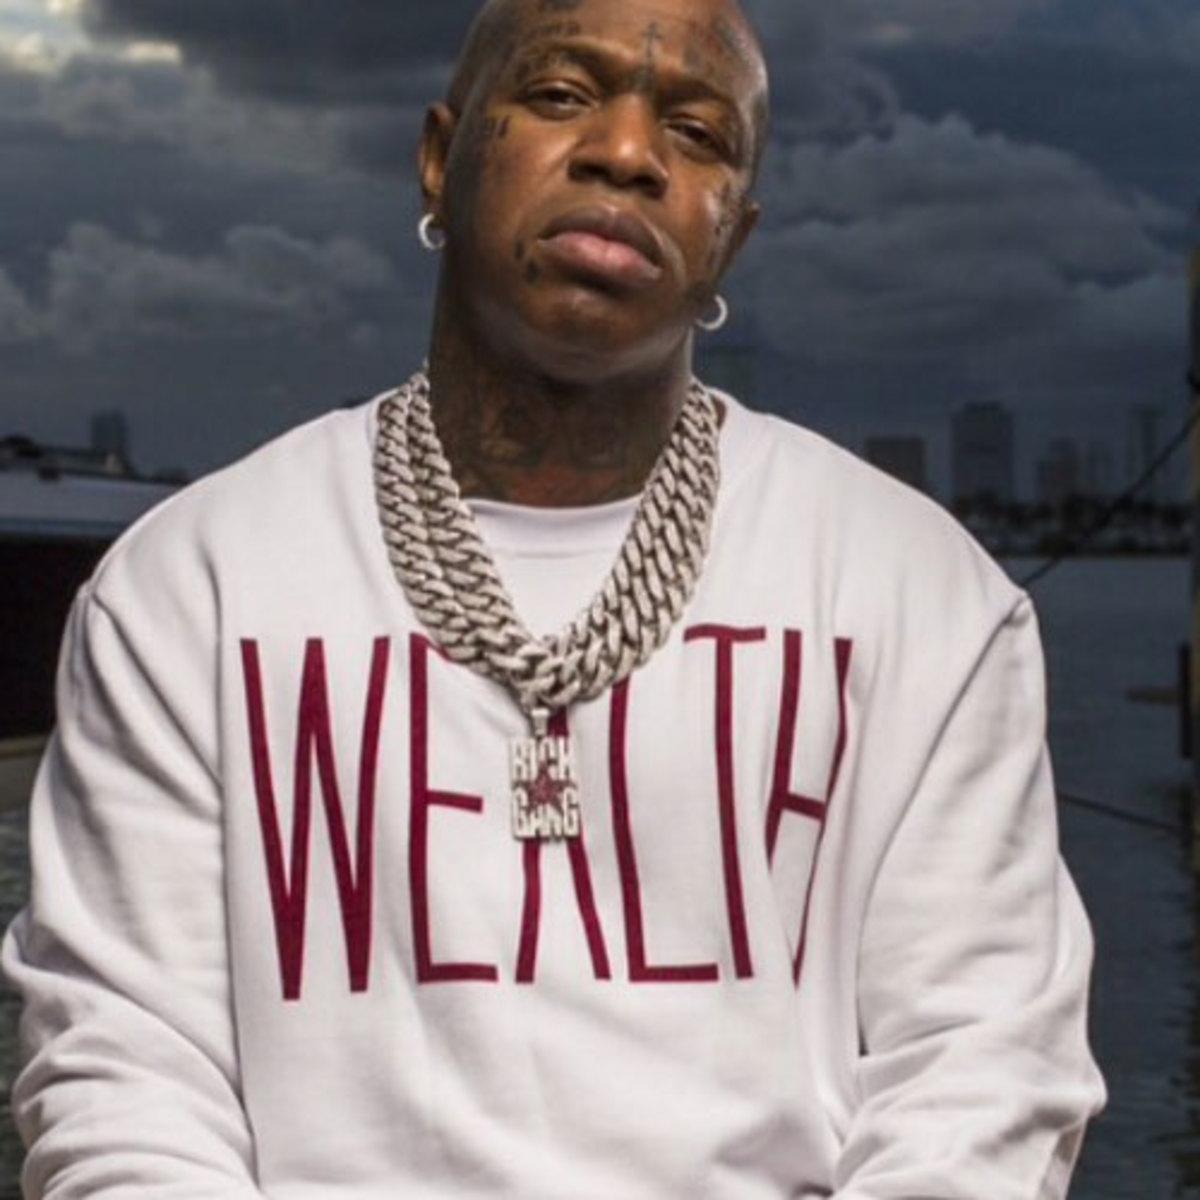 birdman-wealth-t.jpg